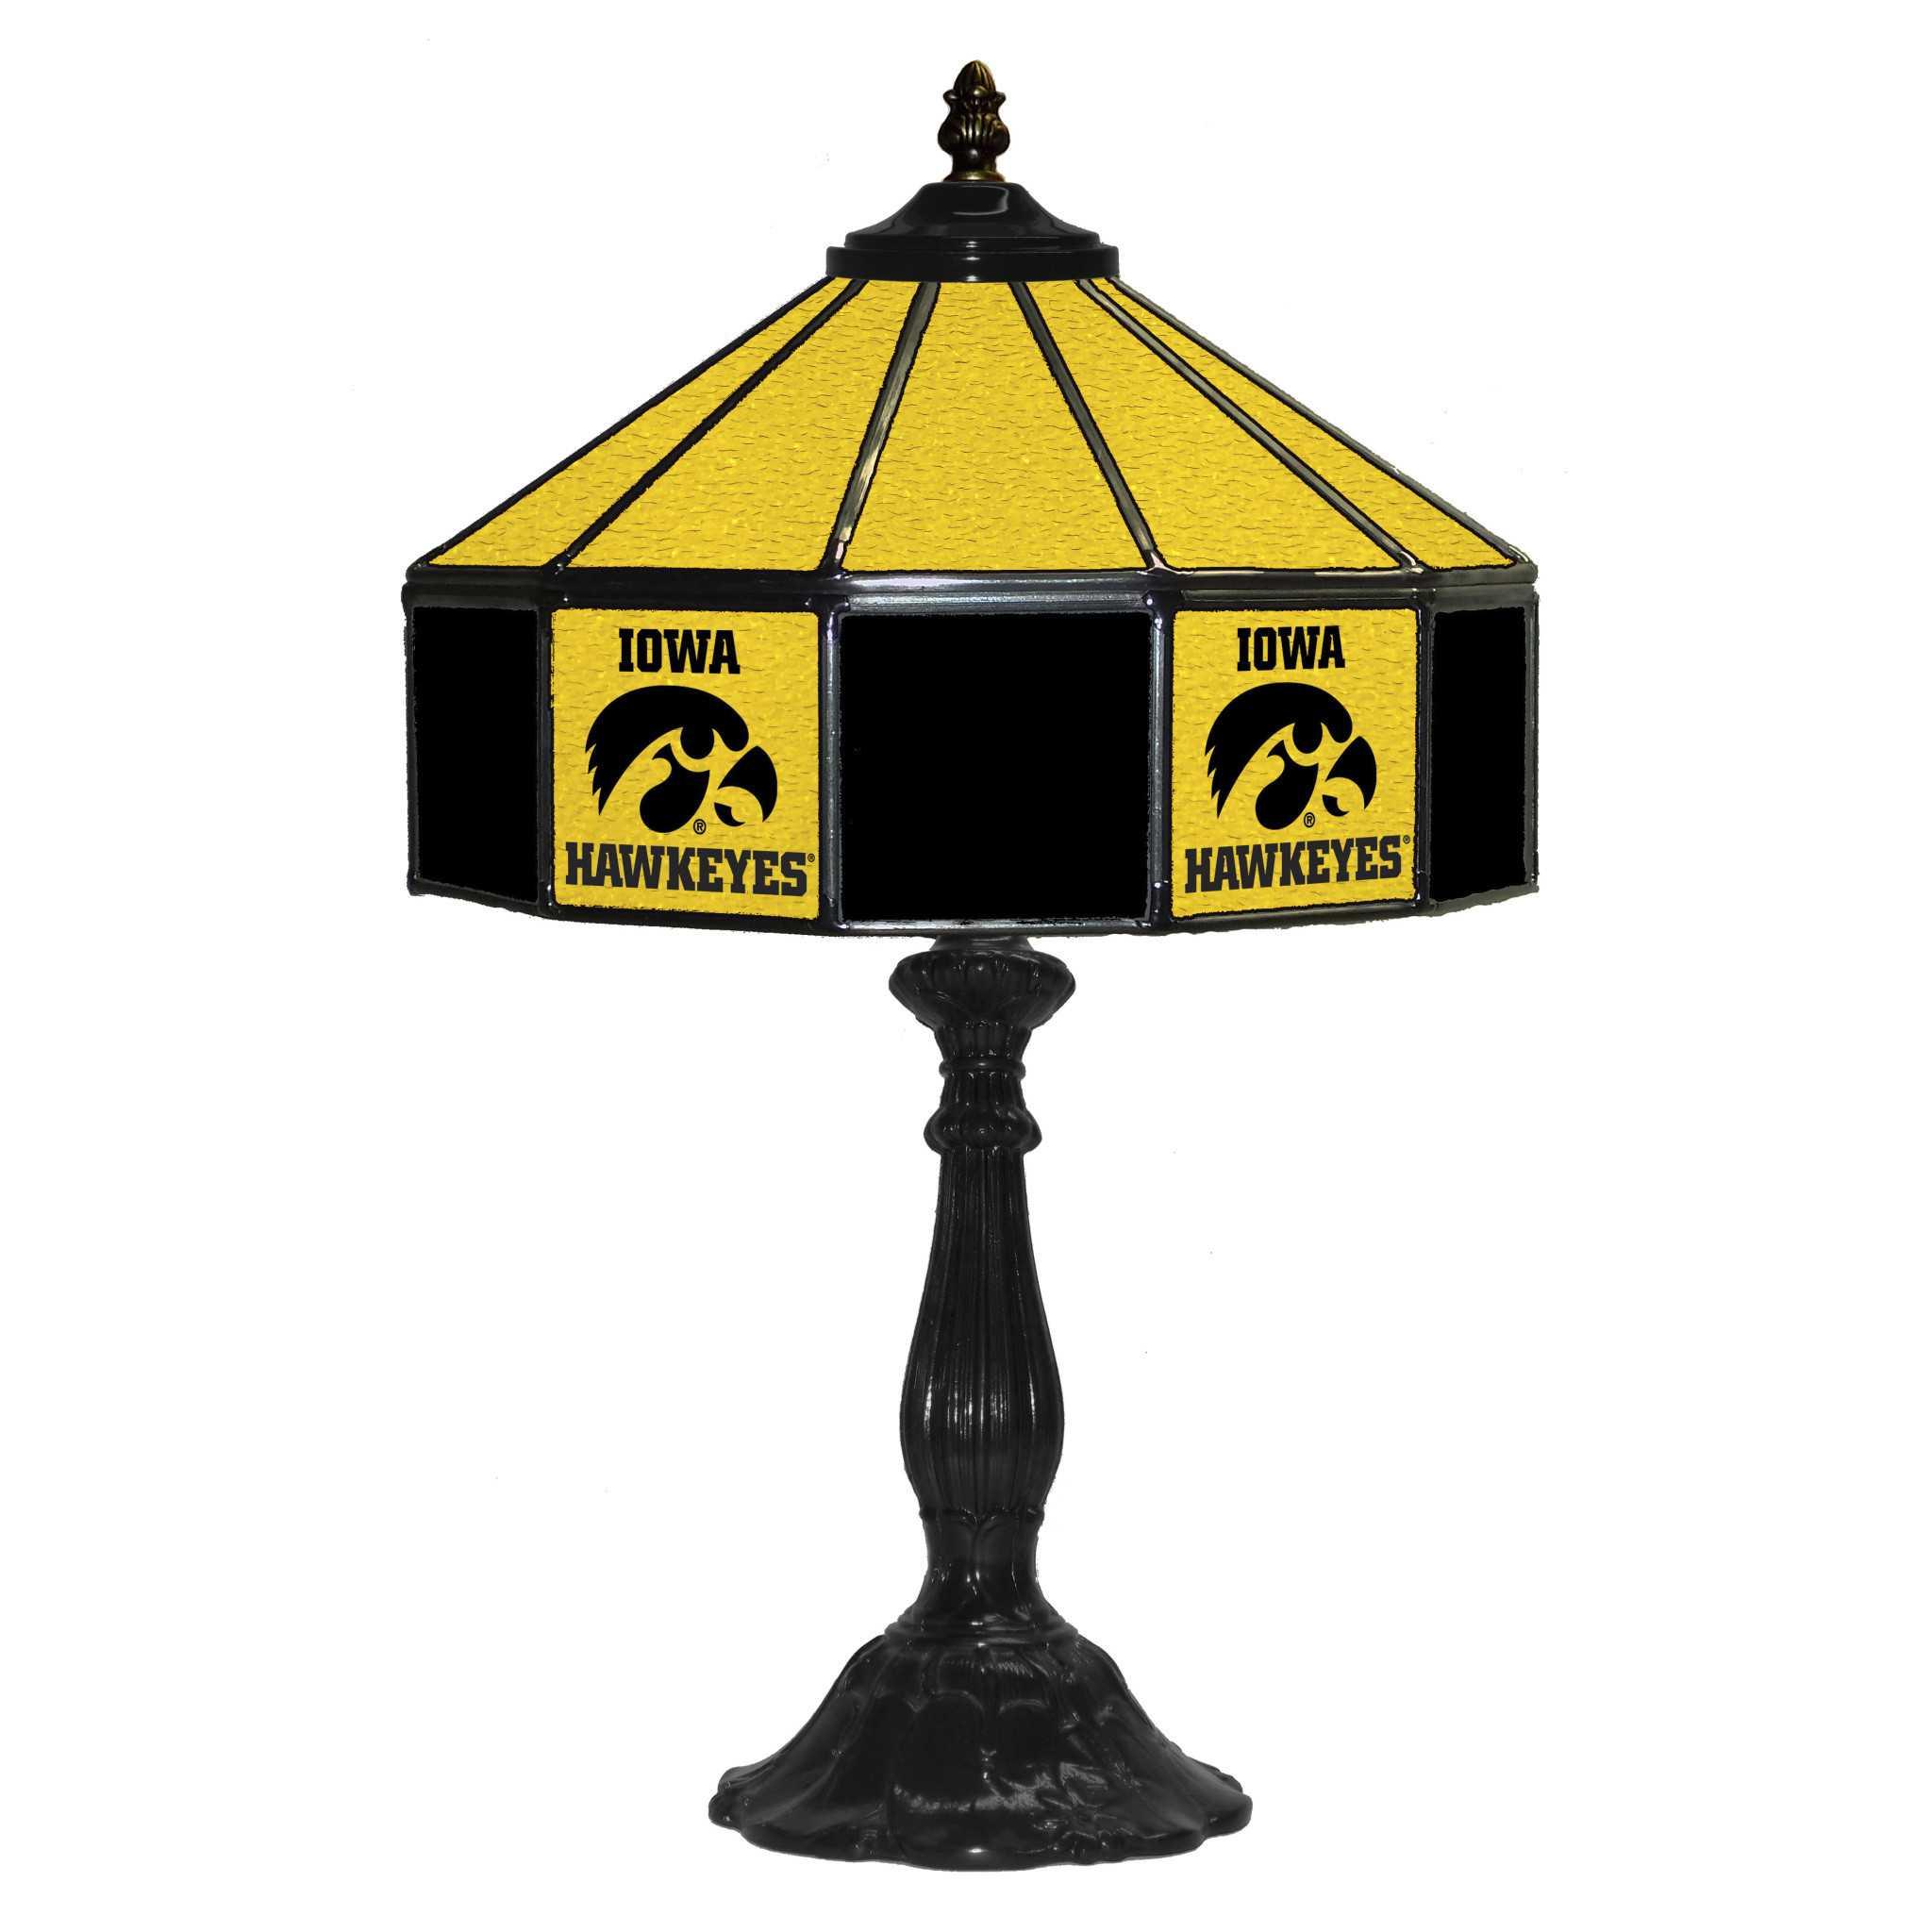 "UNIVERSITY OF IOWA 21"" GLASS TABLE LAMP"